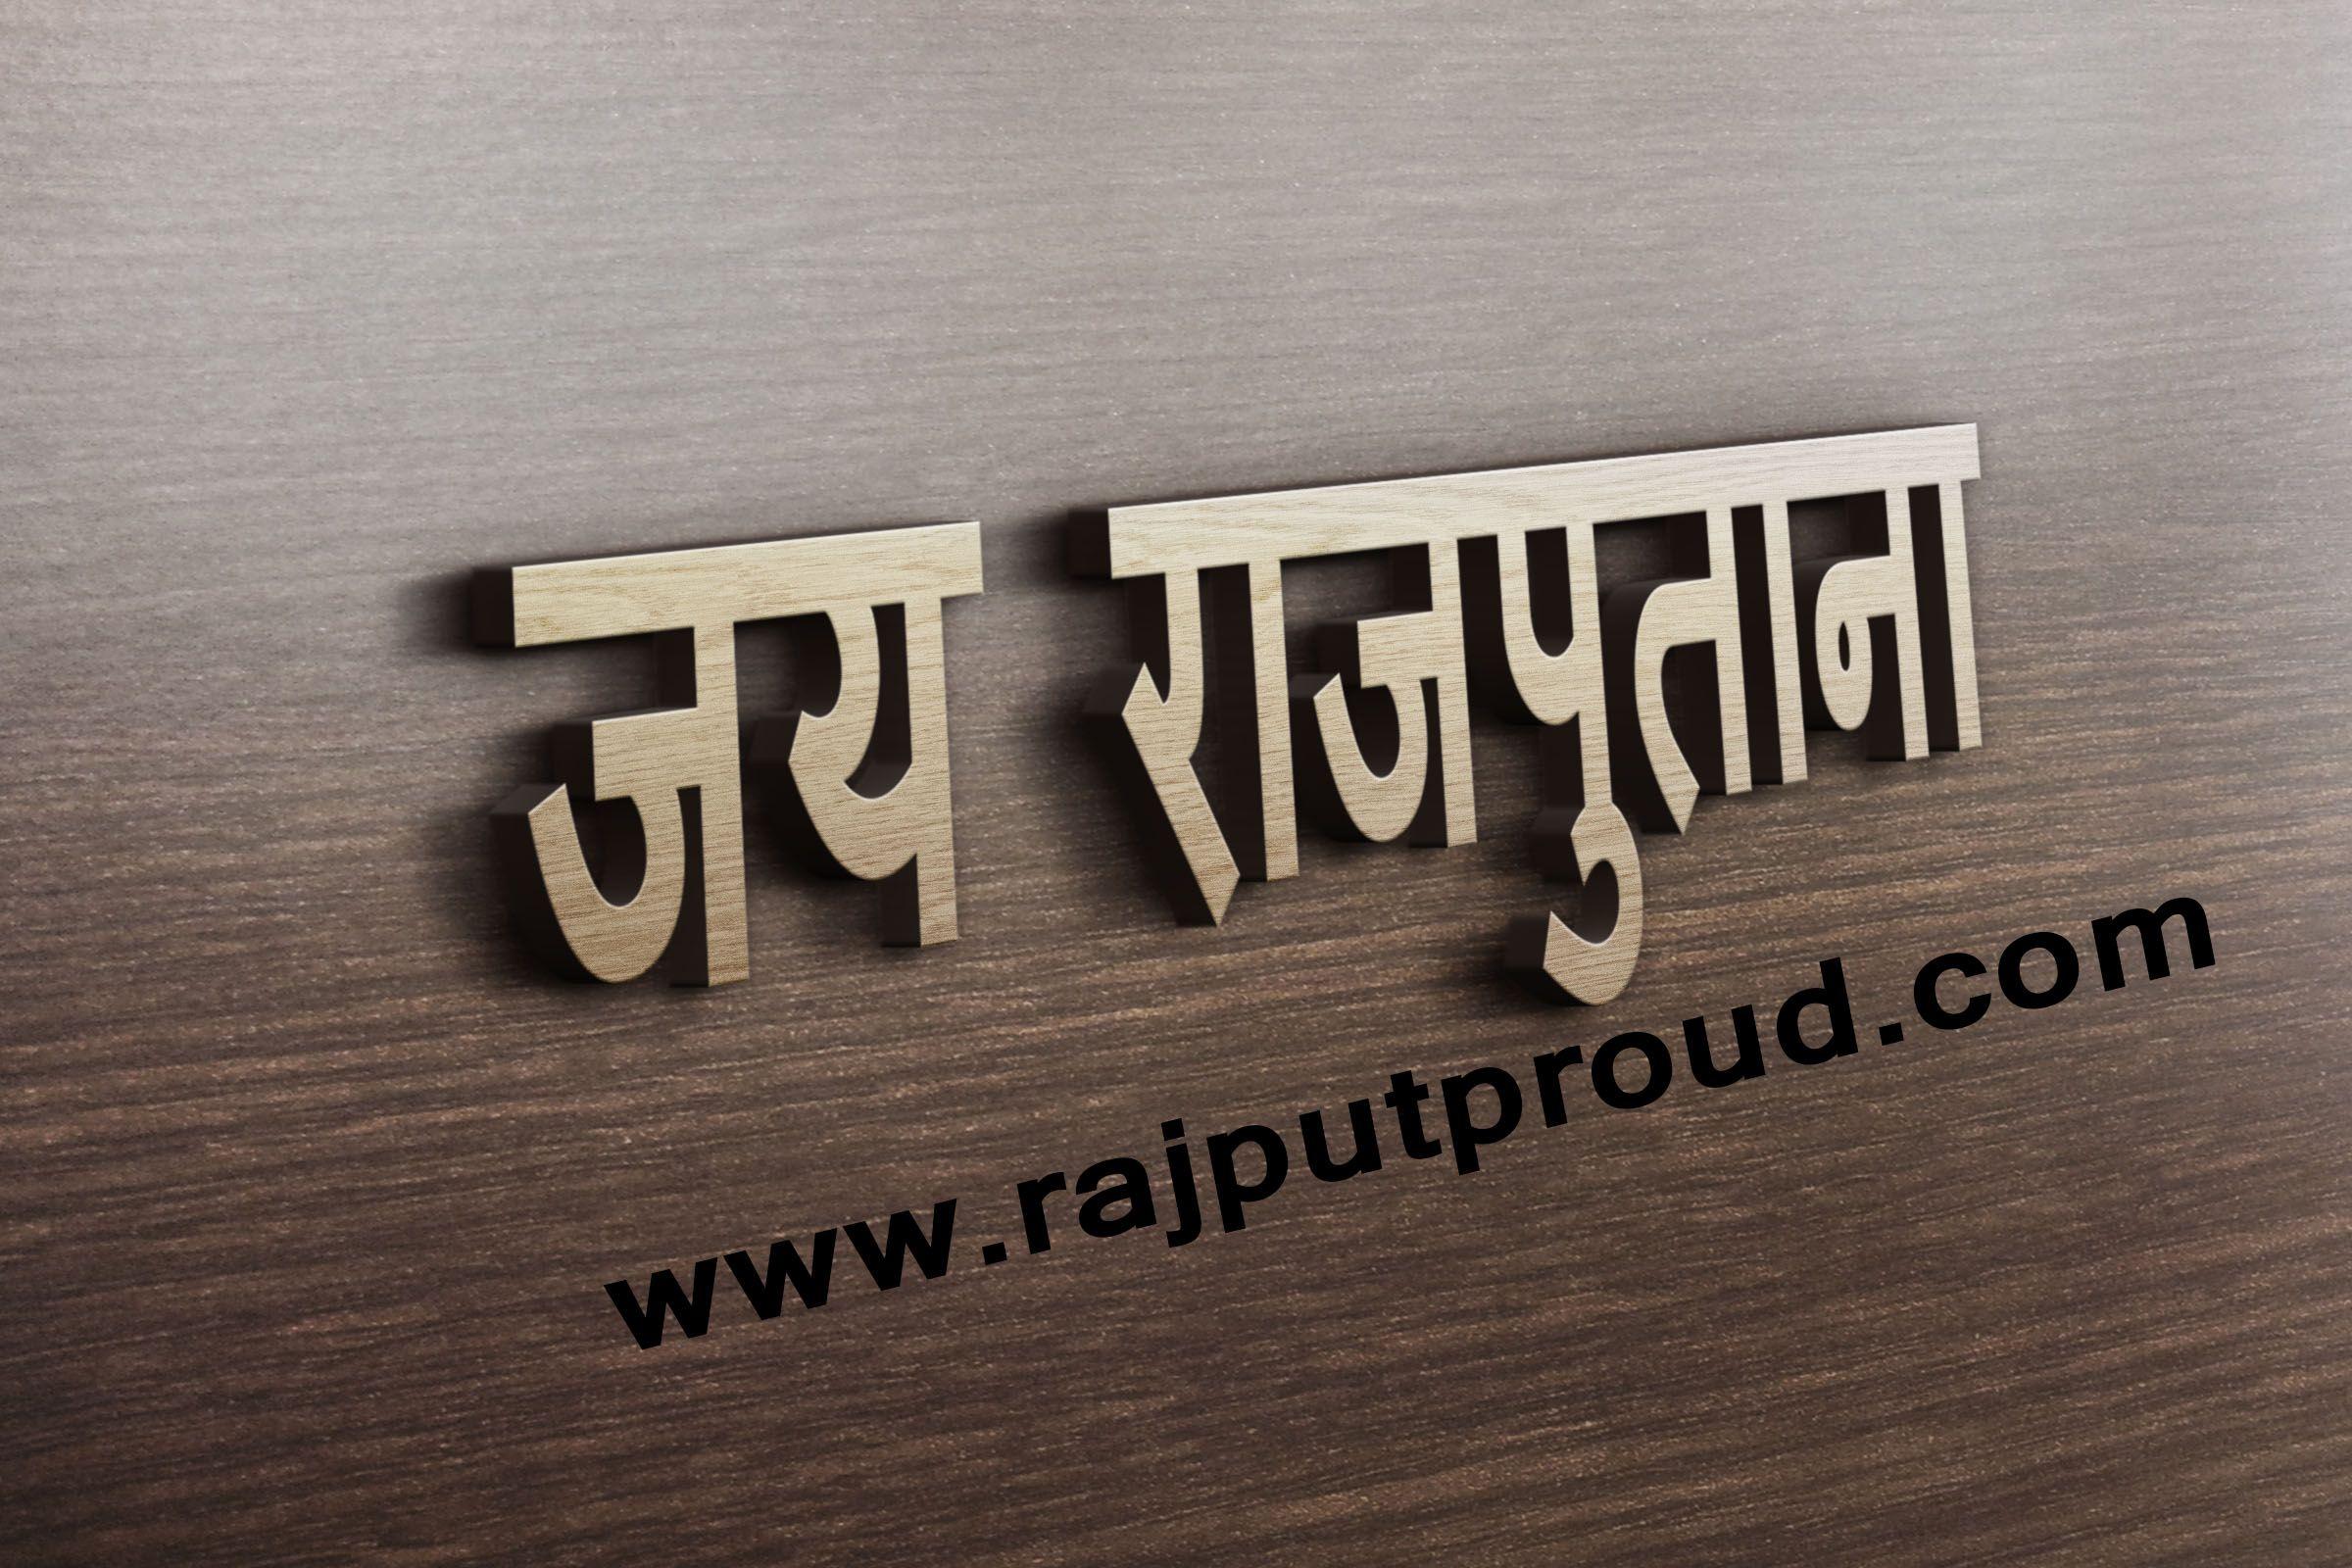 Rajputana 3D Logo Rajput quotes, History wallpaper